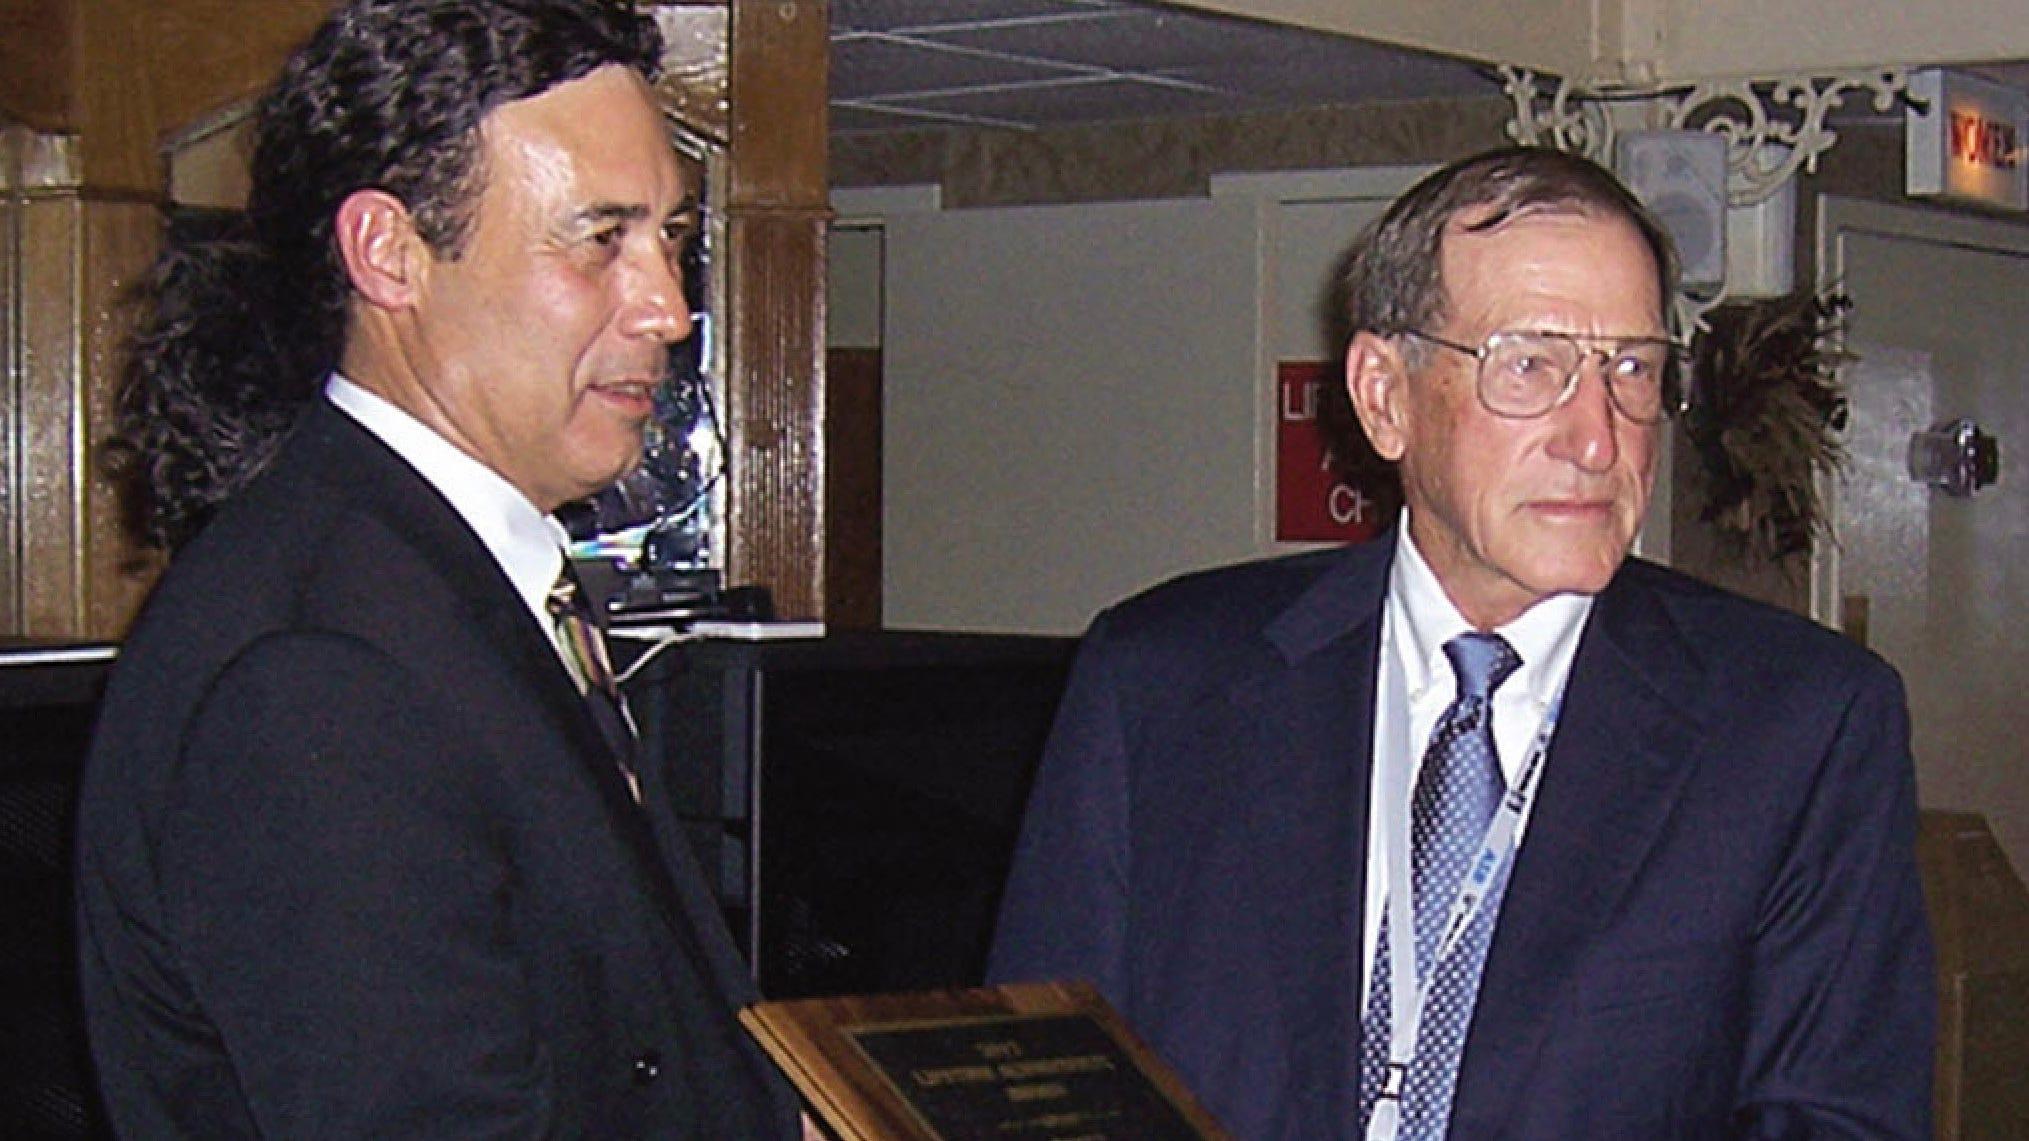 Michigan football saw Paris. York County donor Donald Graham's family scored millions